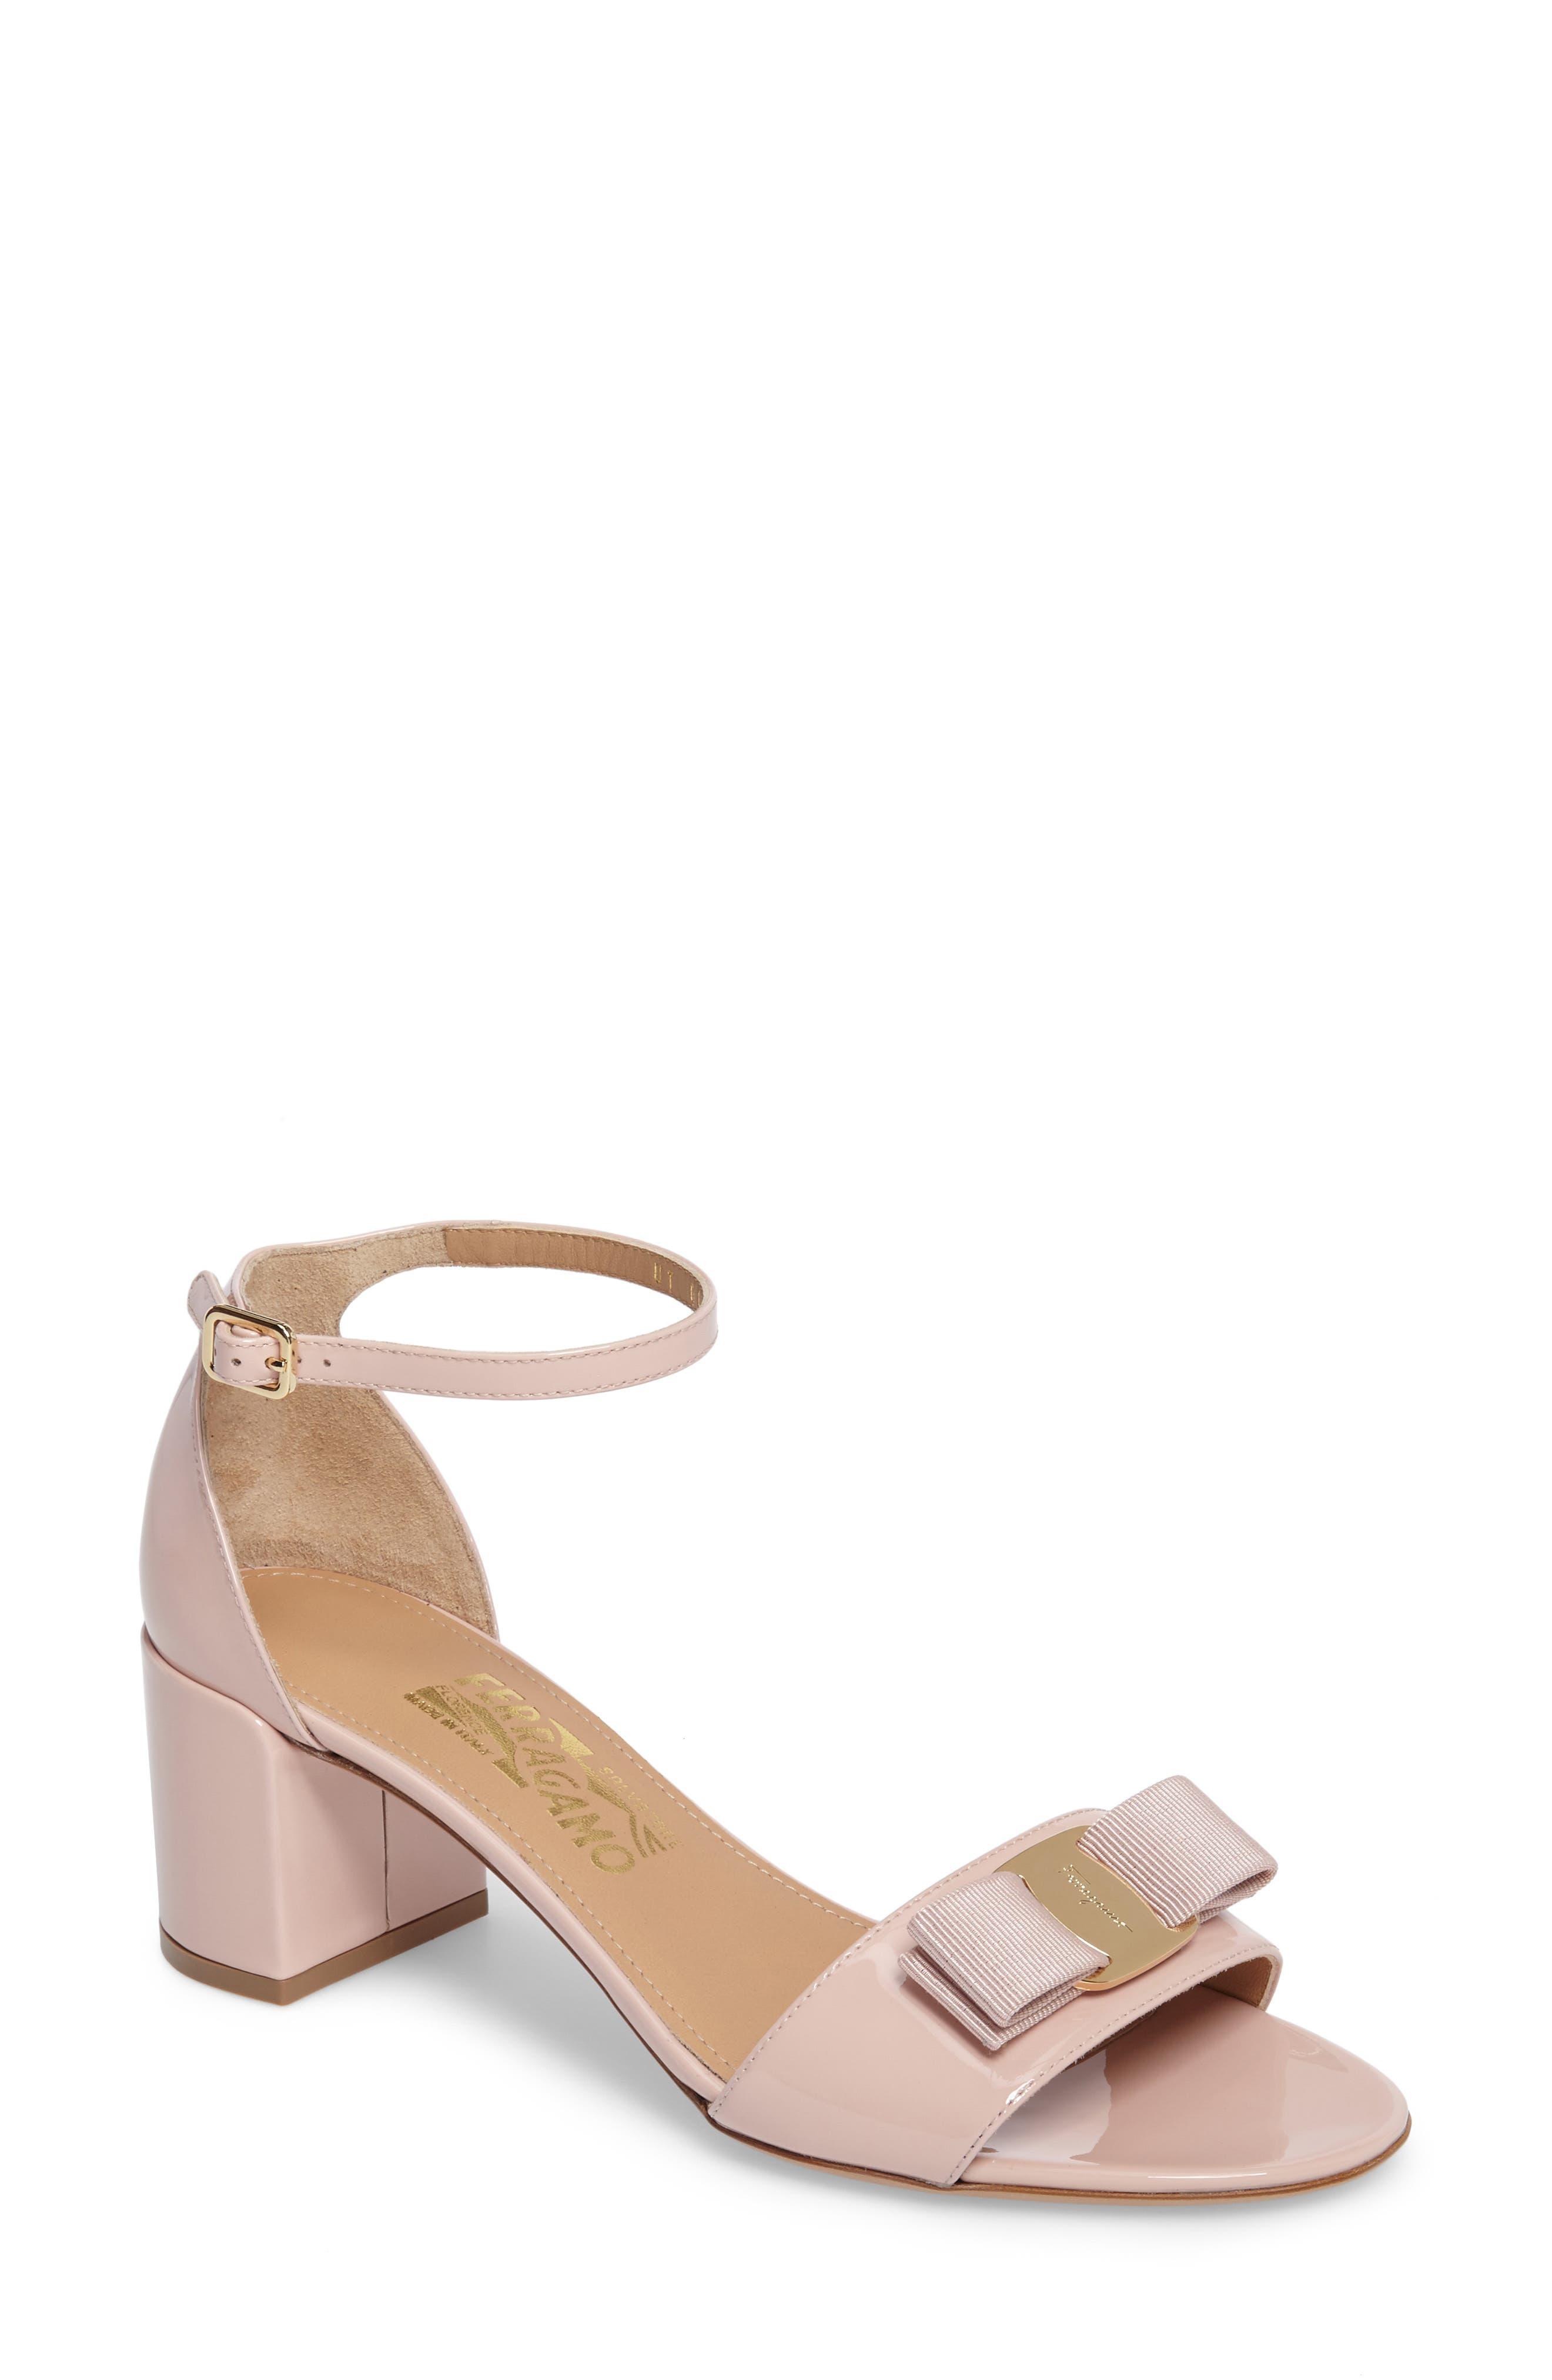 Gavina Ankle Strap Sandal,                         Main,                         color, Bon Bon Pink